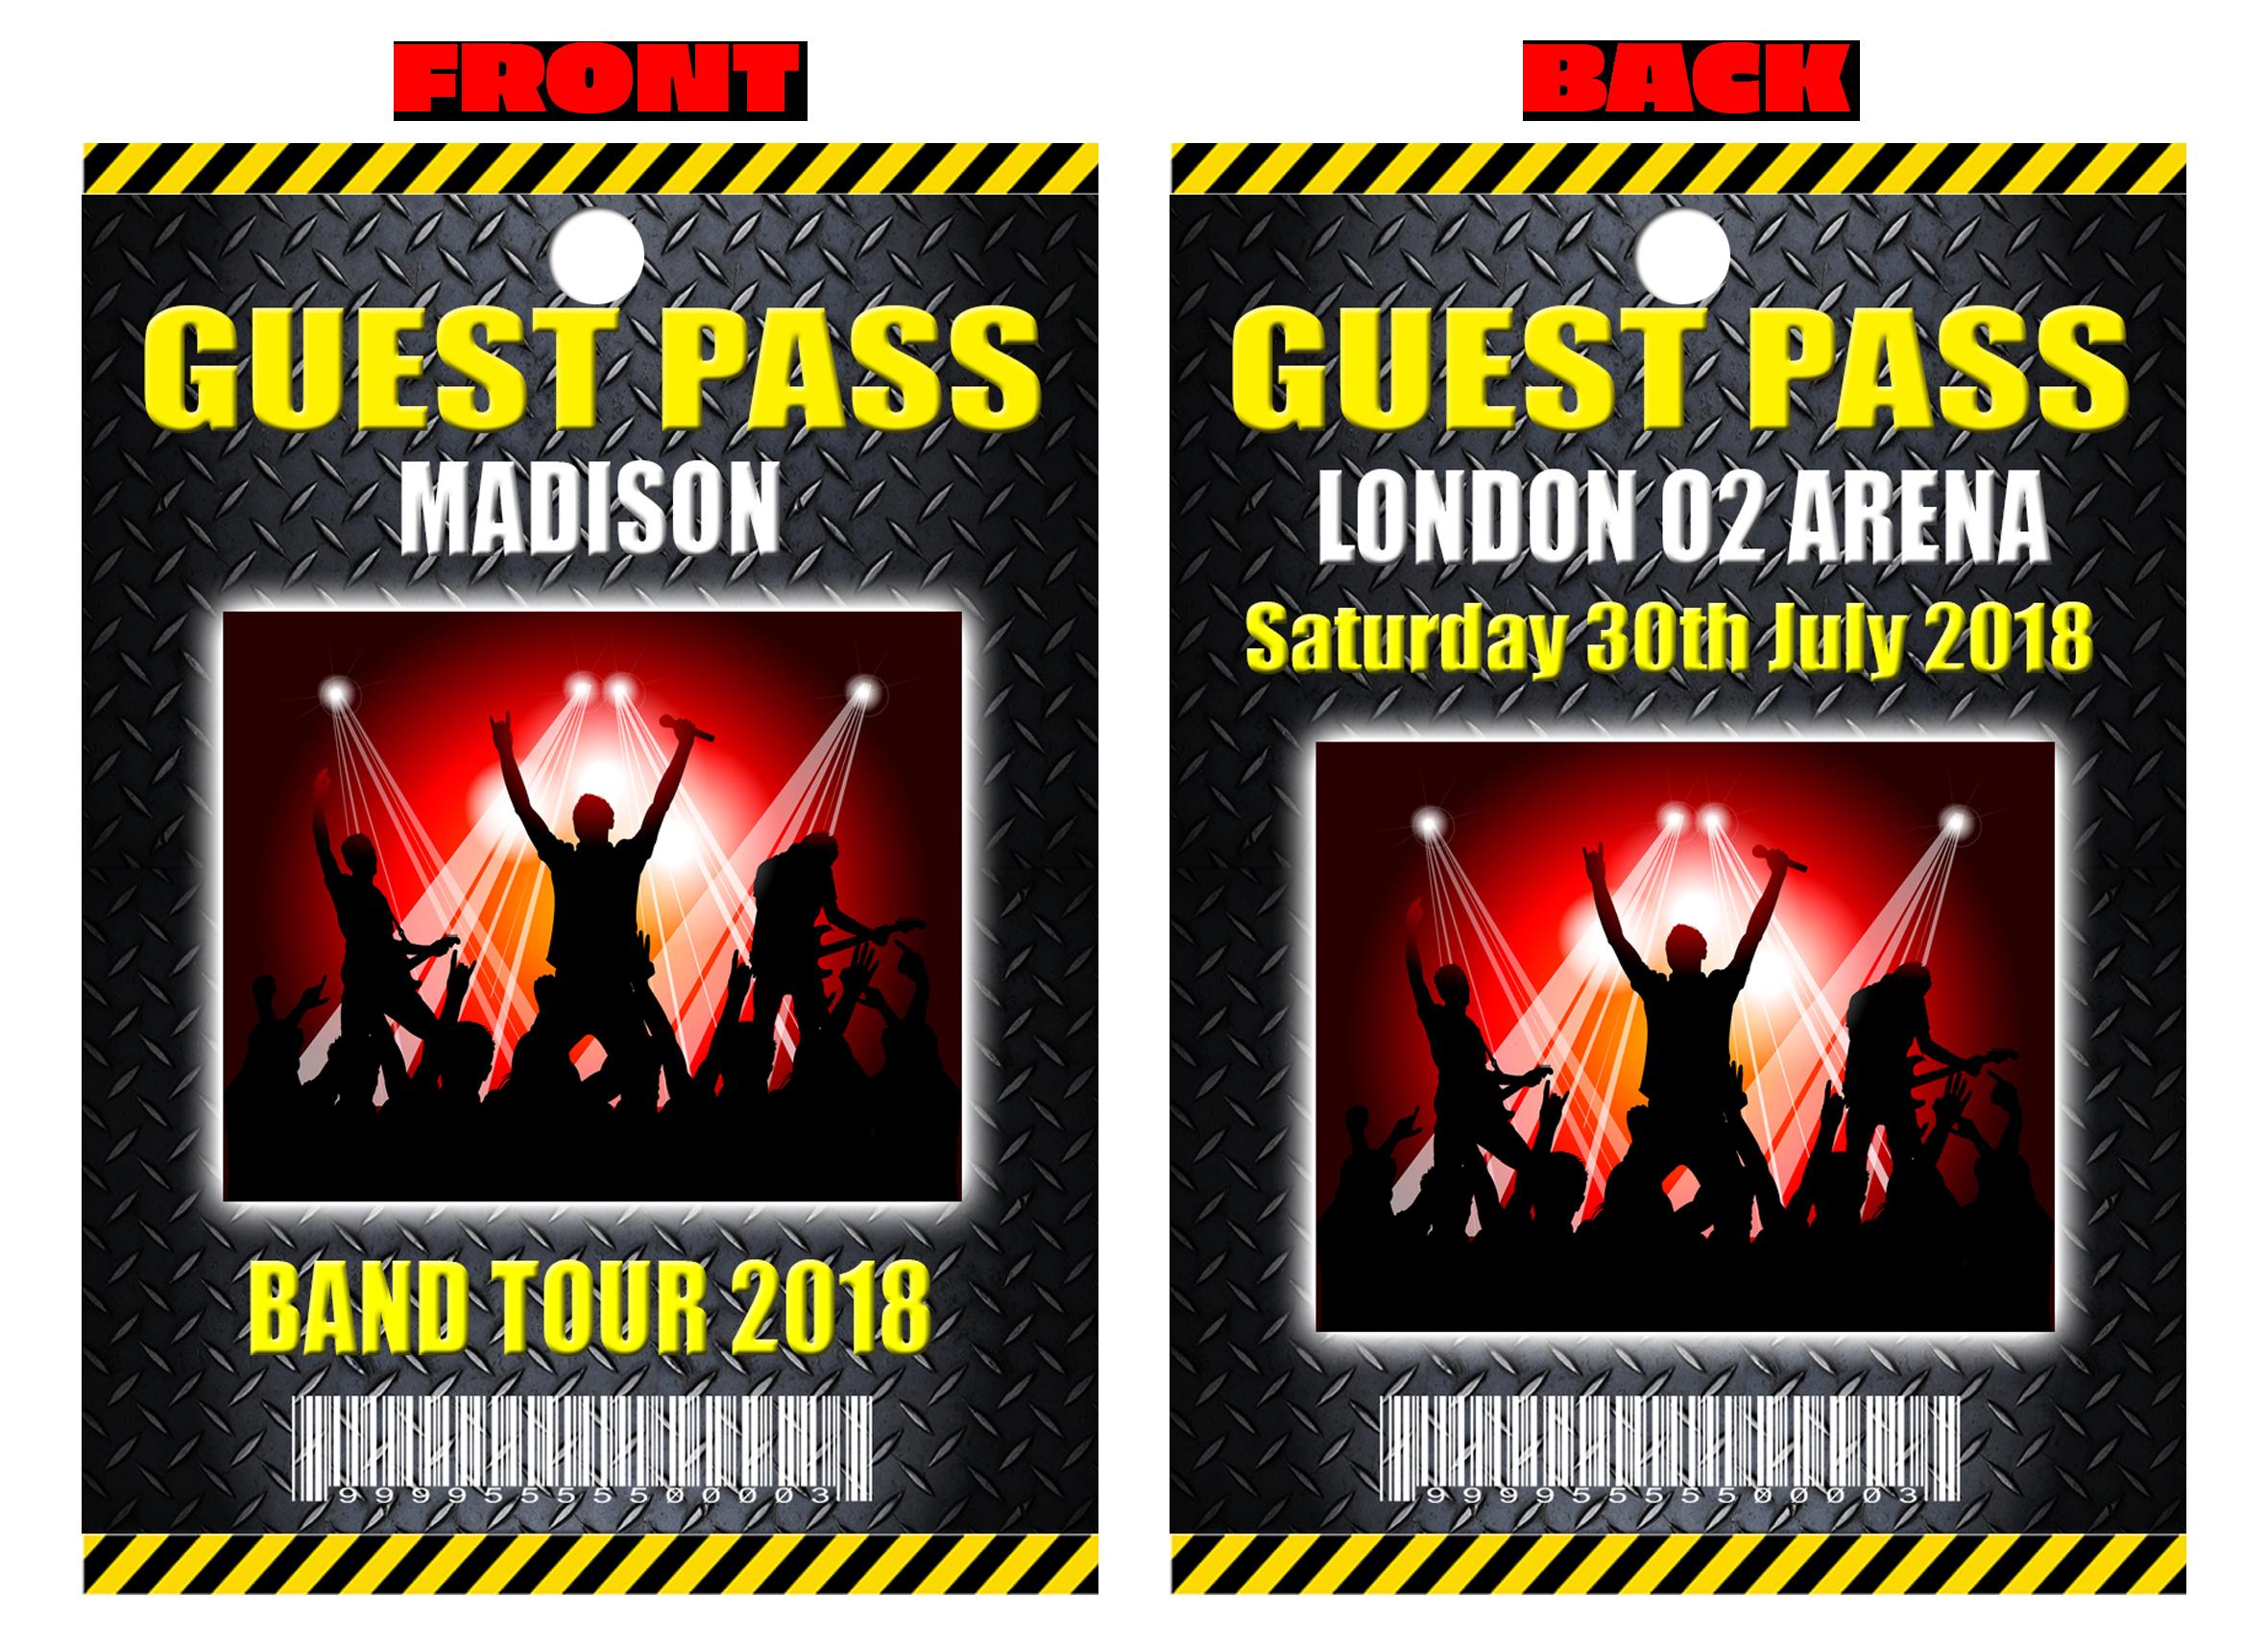 Guest pass or event. Festival clipart pop concert